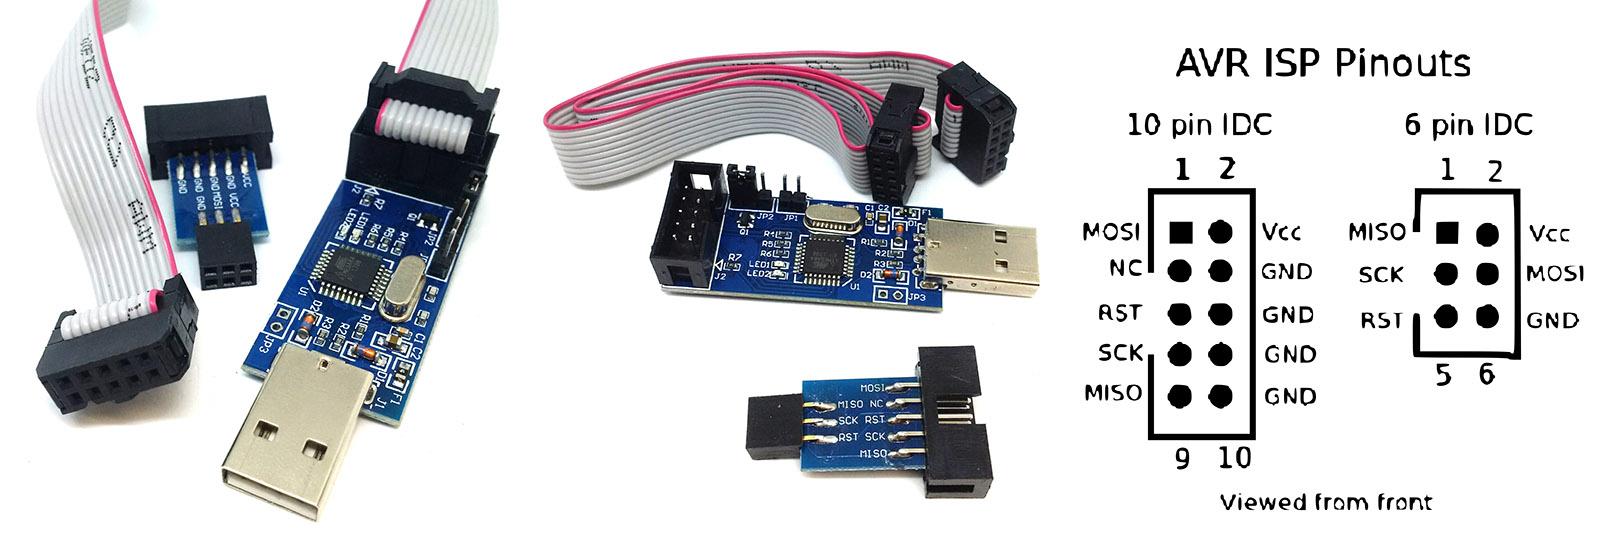 Usbasp Avr Usb Programmer Pocketmagic For Atmel Controllers